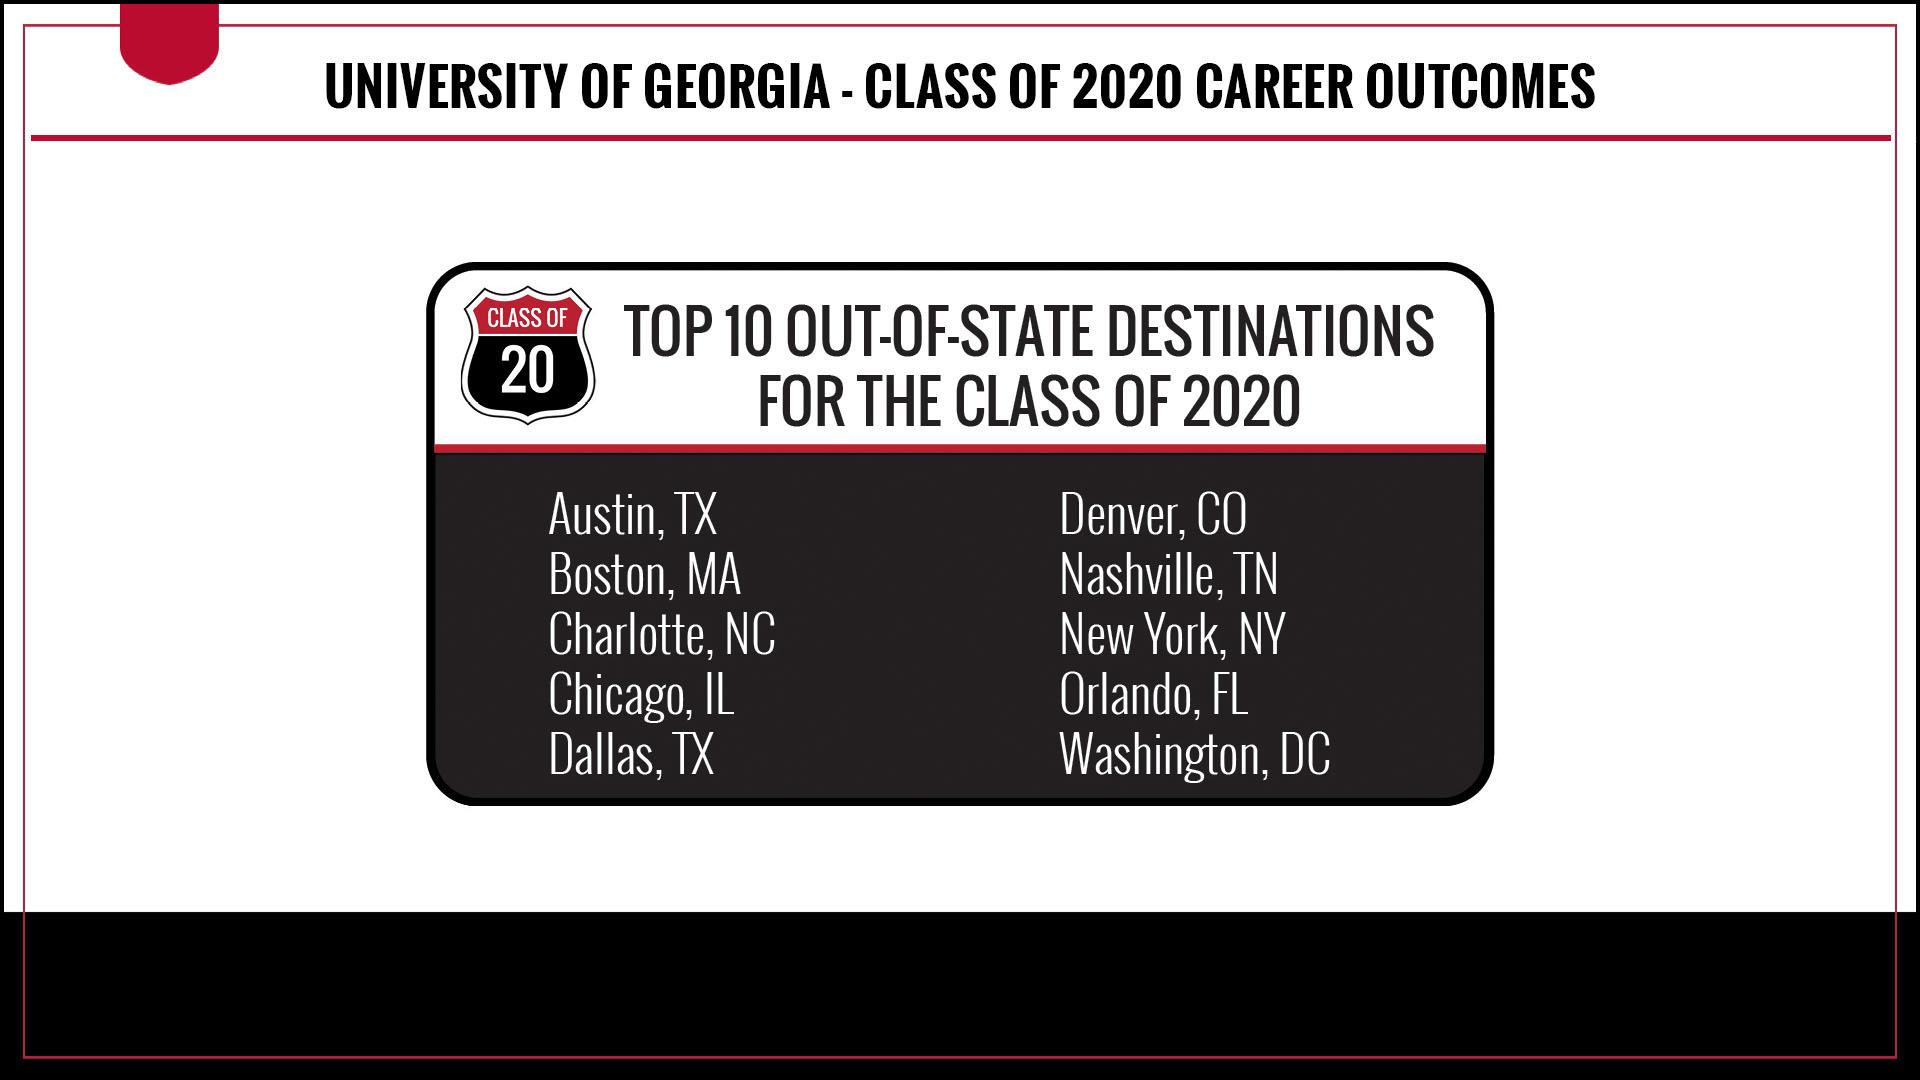 Top Out-of-State destinations for the class of 2020 include - Austin, Texas - Boston, Massachusetts - Charlotte, North Carolina - Chicago, Illinois - Dallas, Texas - Denver, Colorado - Nashville, Tennessee - New York, New York - Orlando, Florida - Washington, DC